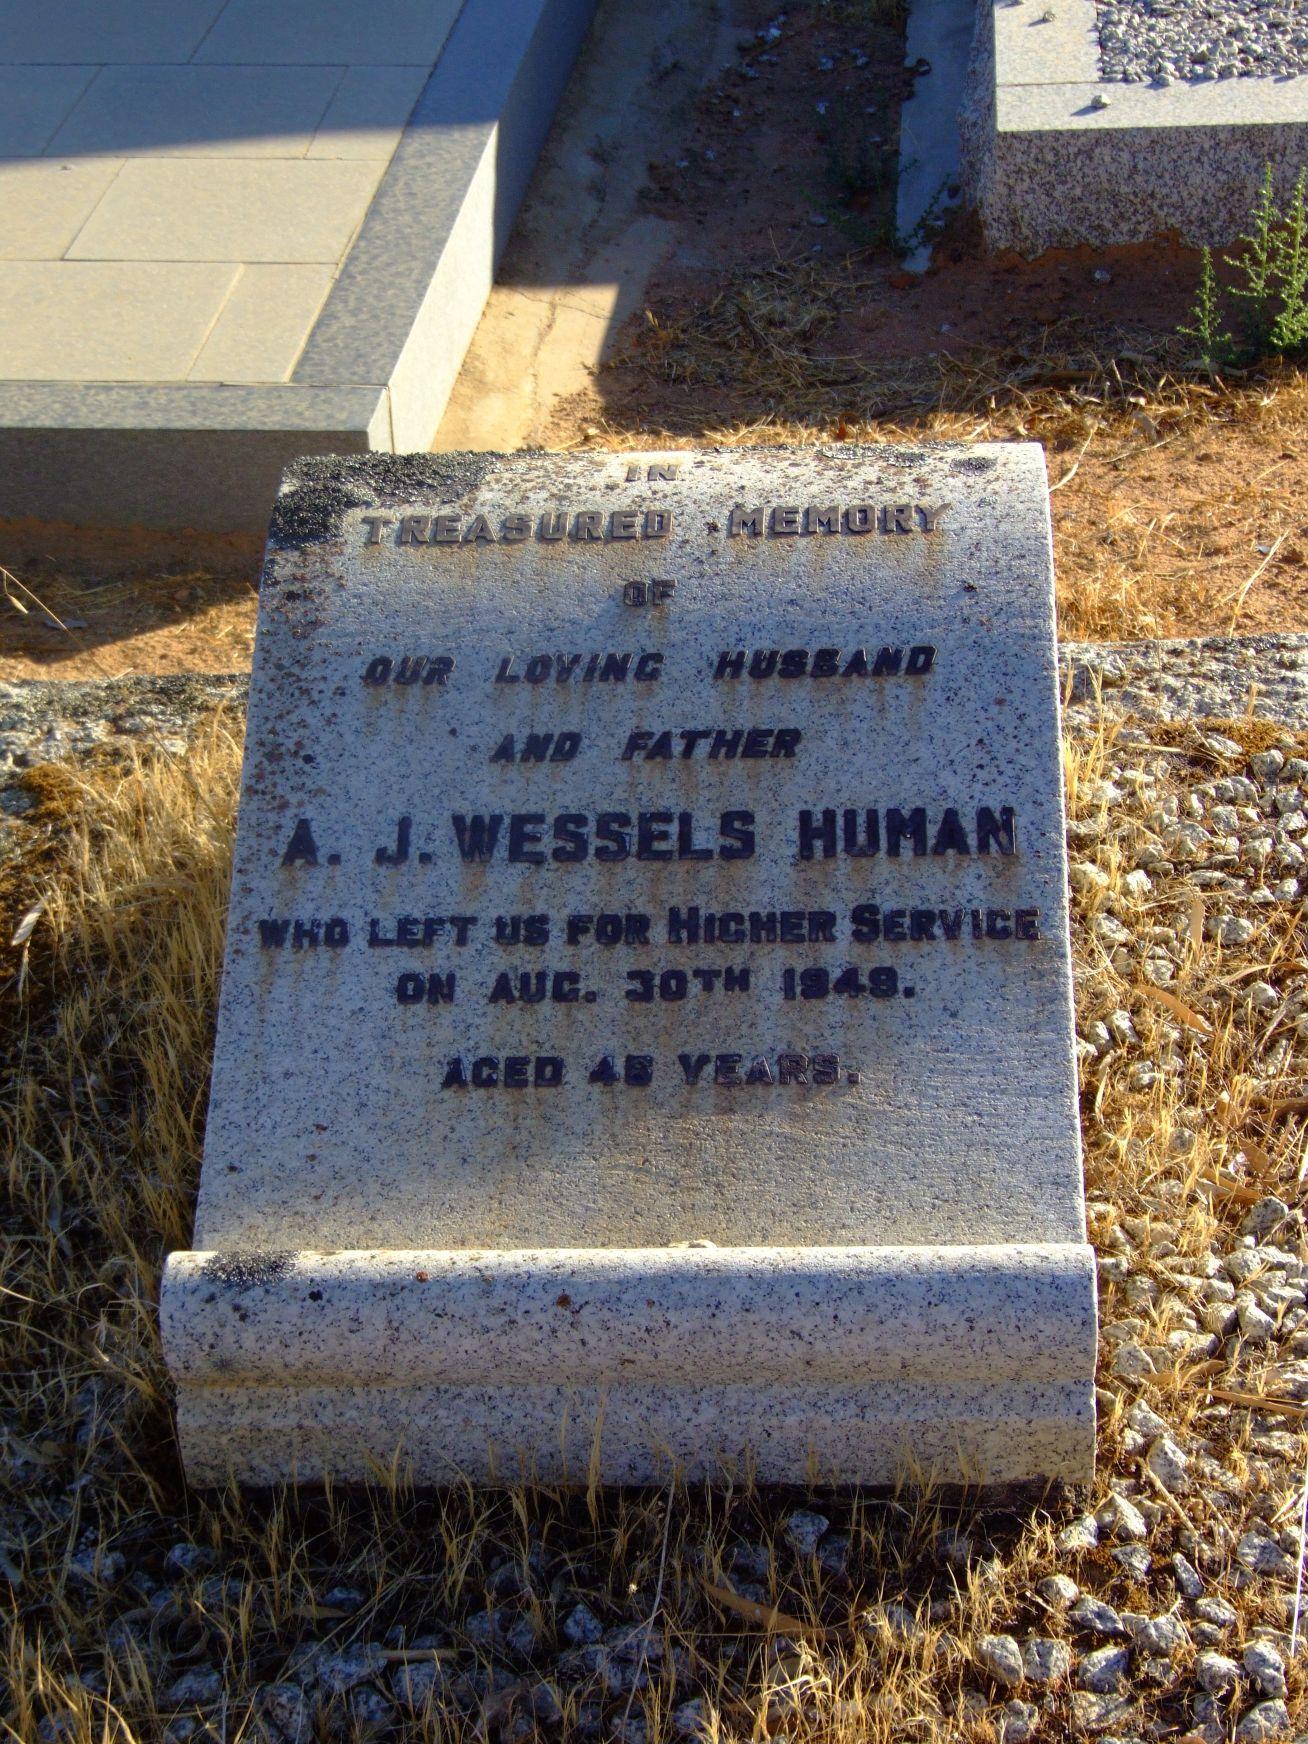 Human, A. J. Wessels